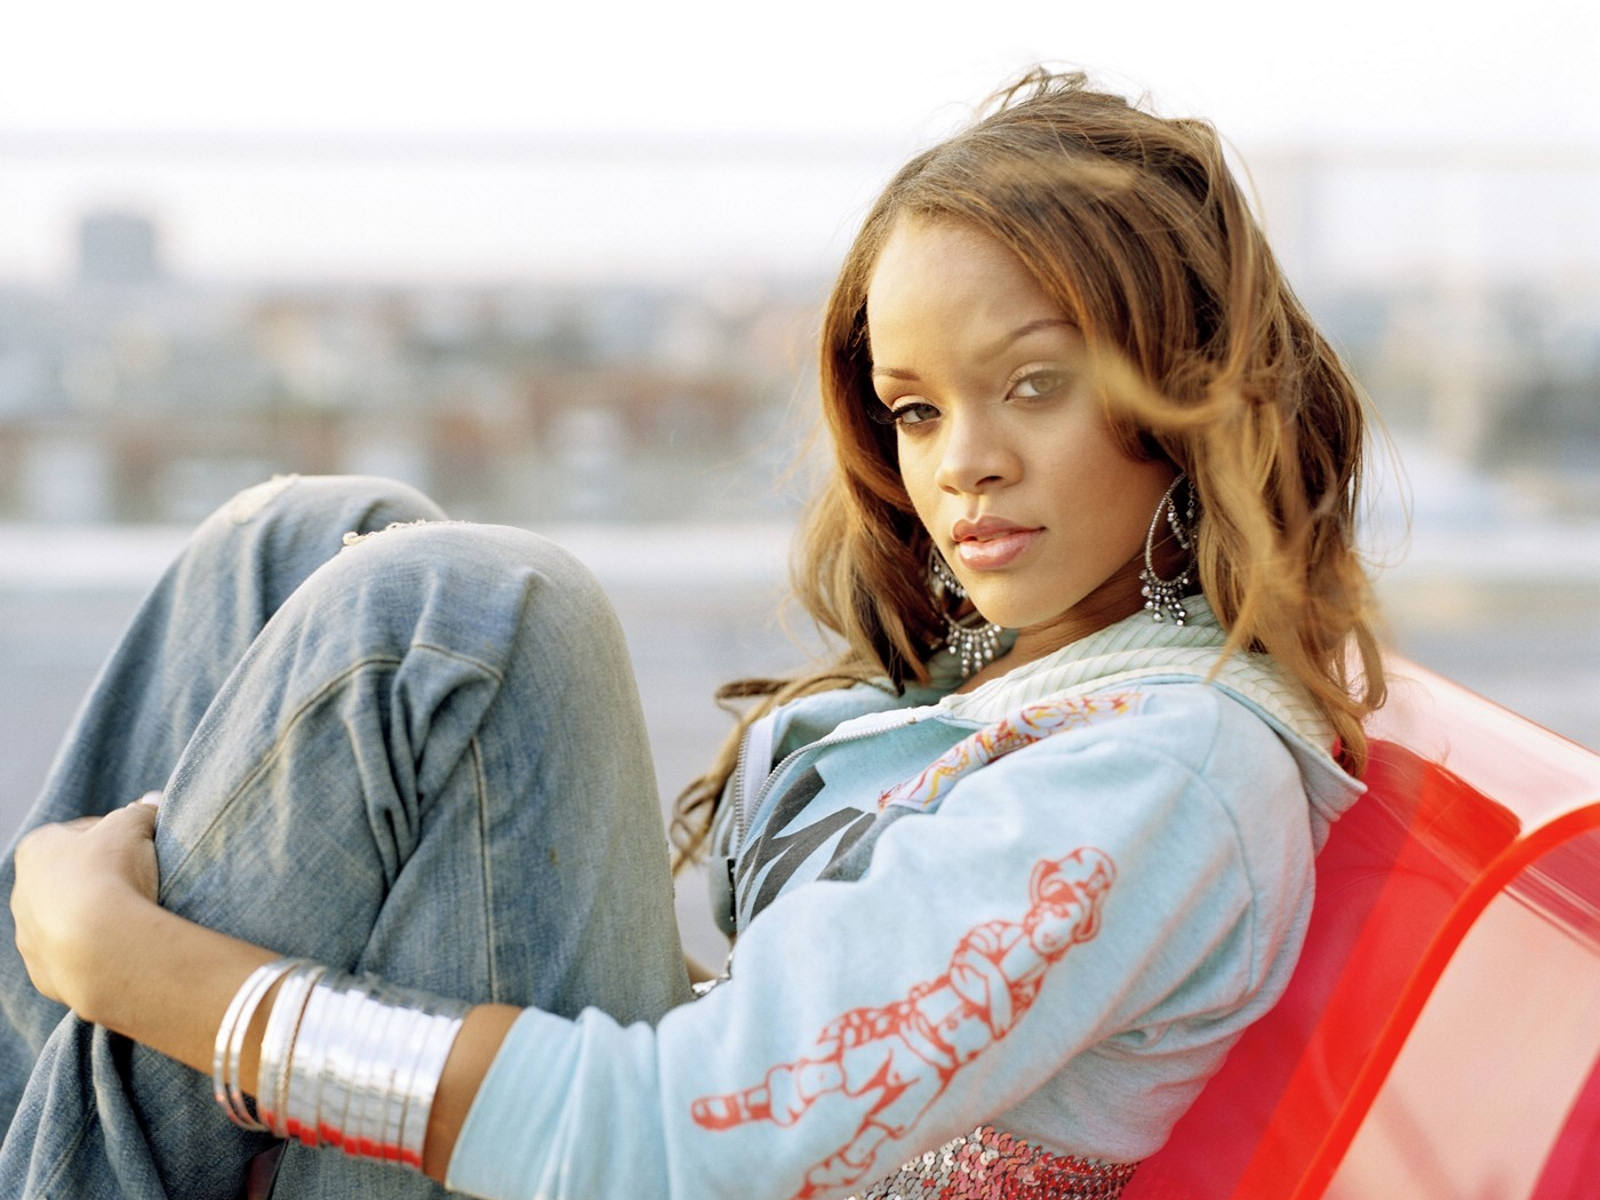 http://1.bp.blogspot.com/-AiET07nSUqA/Tyaj6NWQ9xI/AAAAAAAAC6w/Y6K0OKD-yl4/s1600/Rihanna-Hot-wallpapers-4.jpg